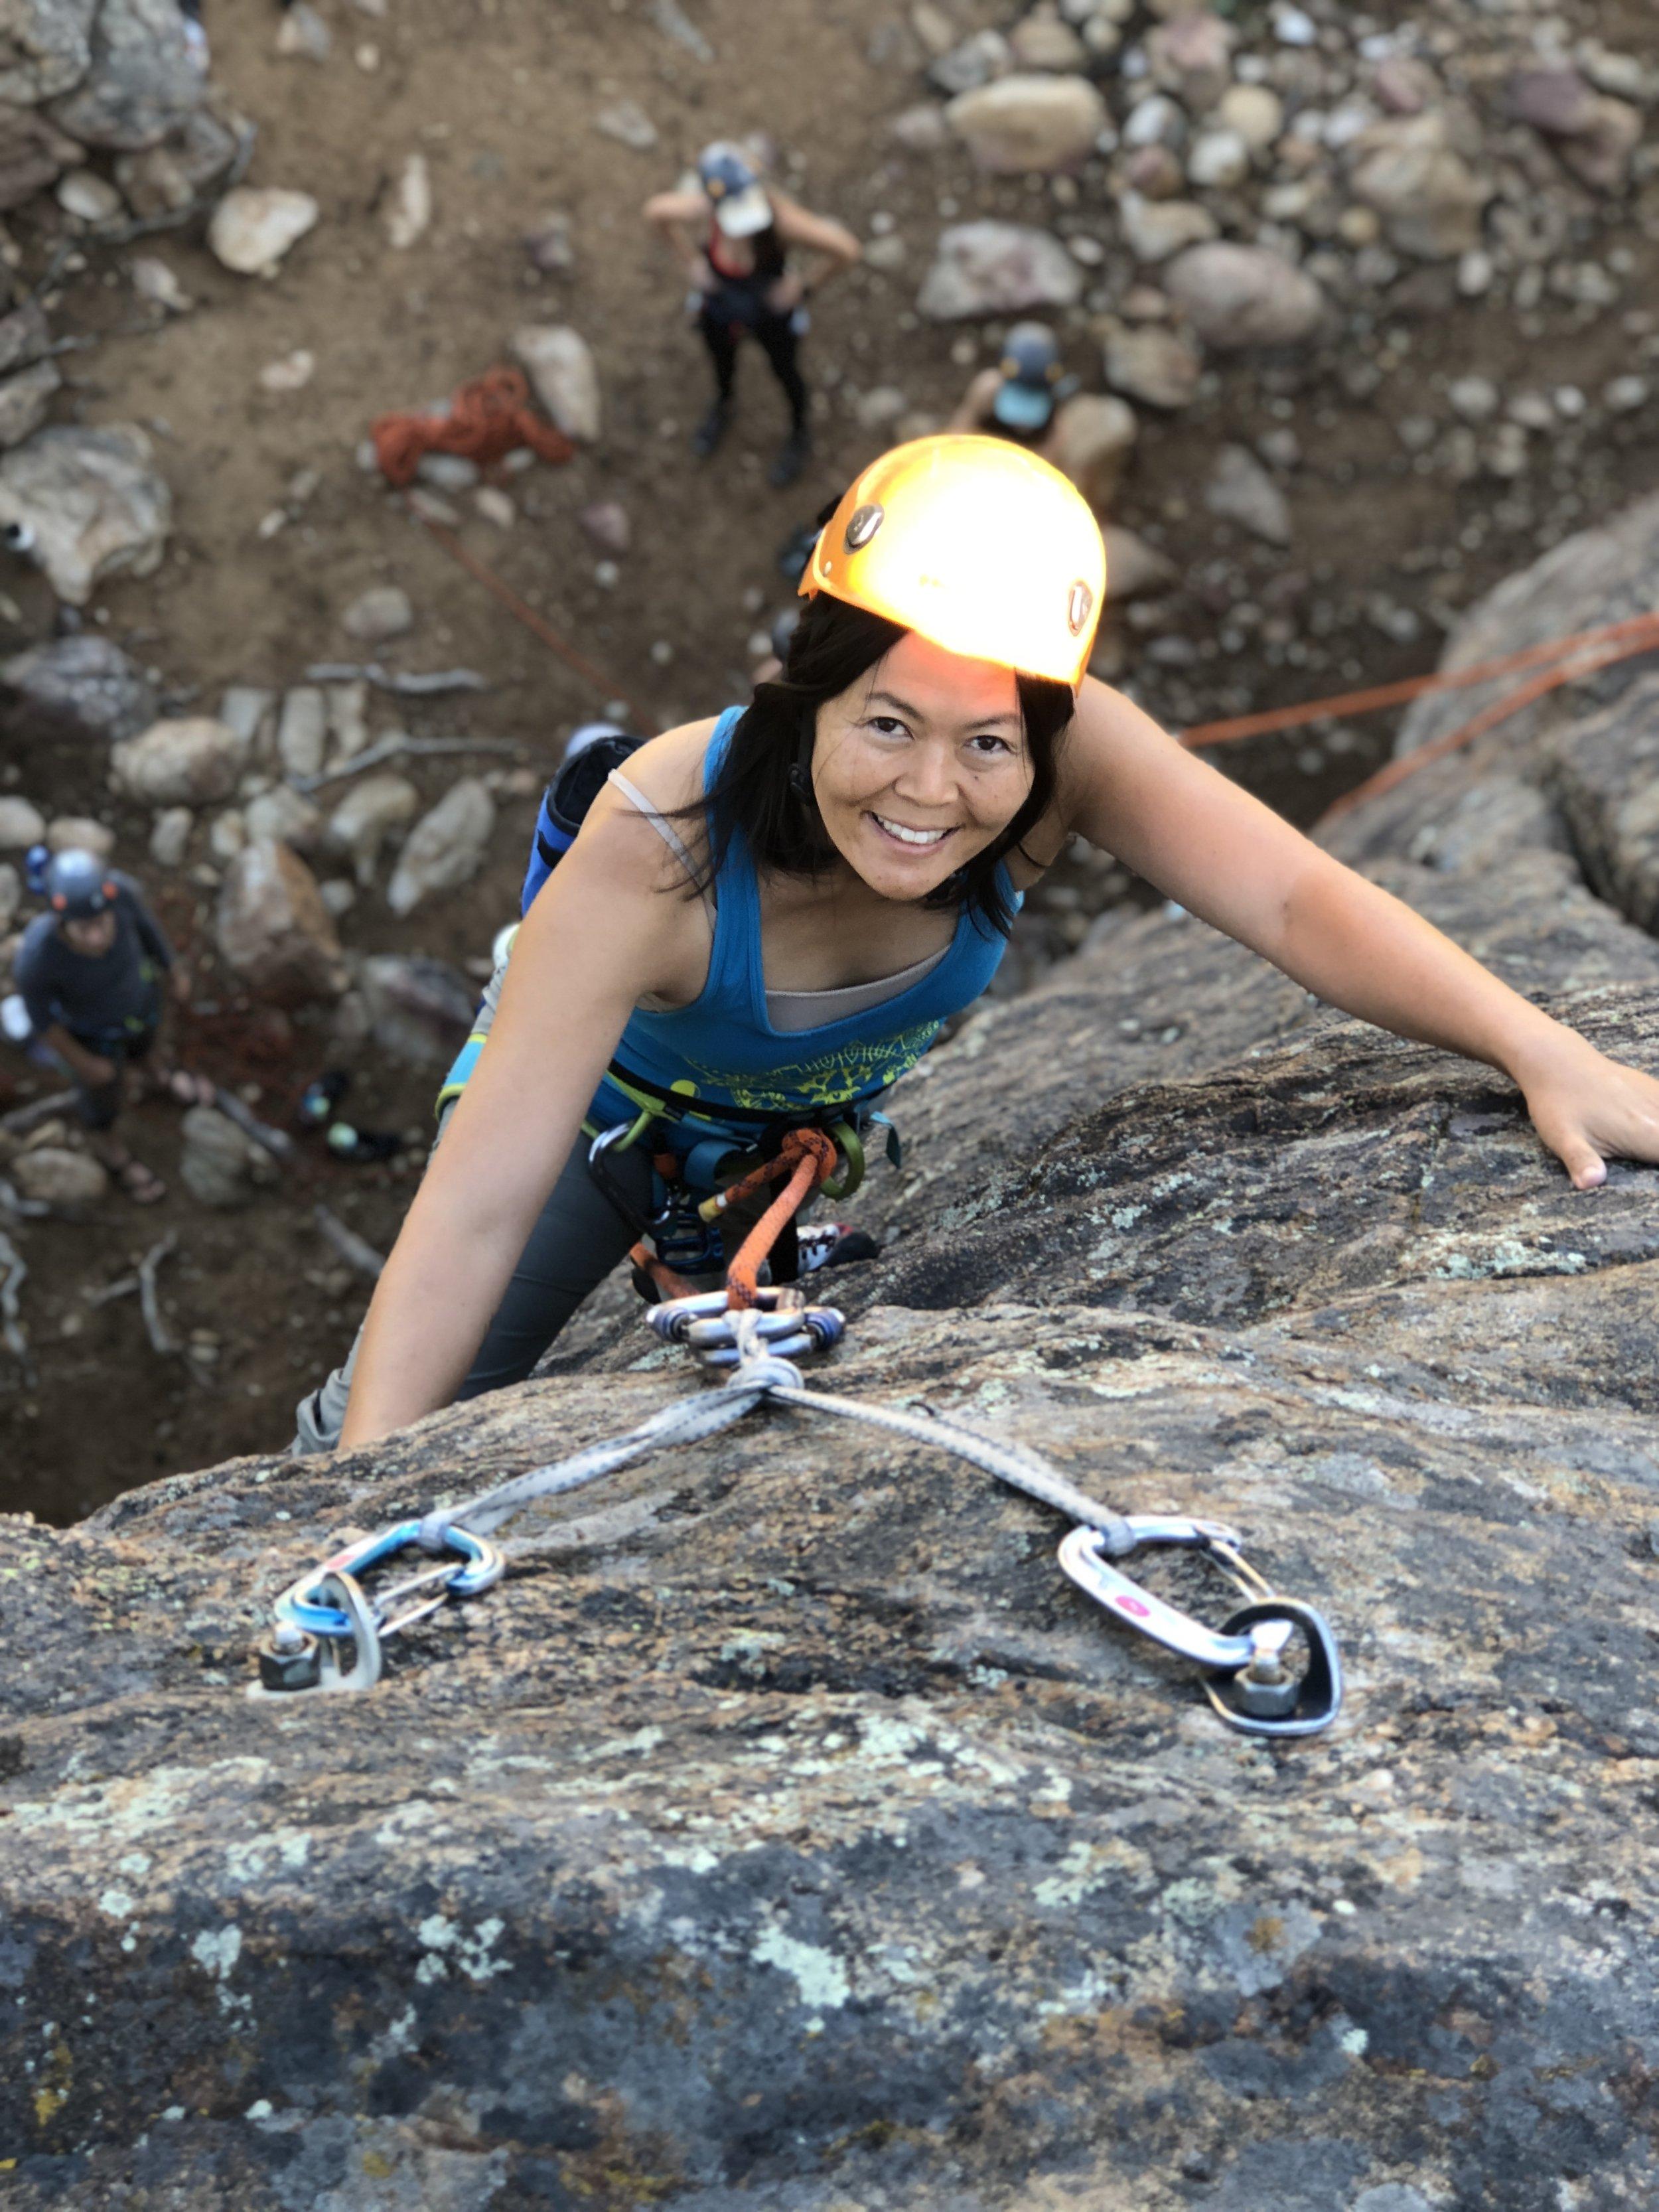 Ladies Weekend Out Colorado Rock Climbing